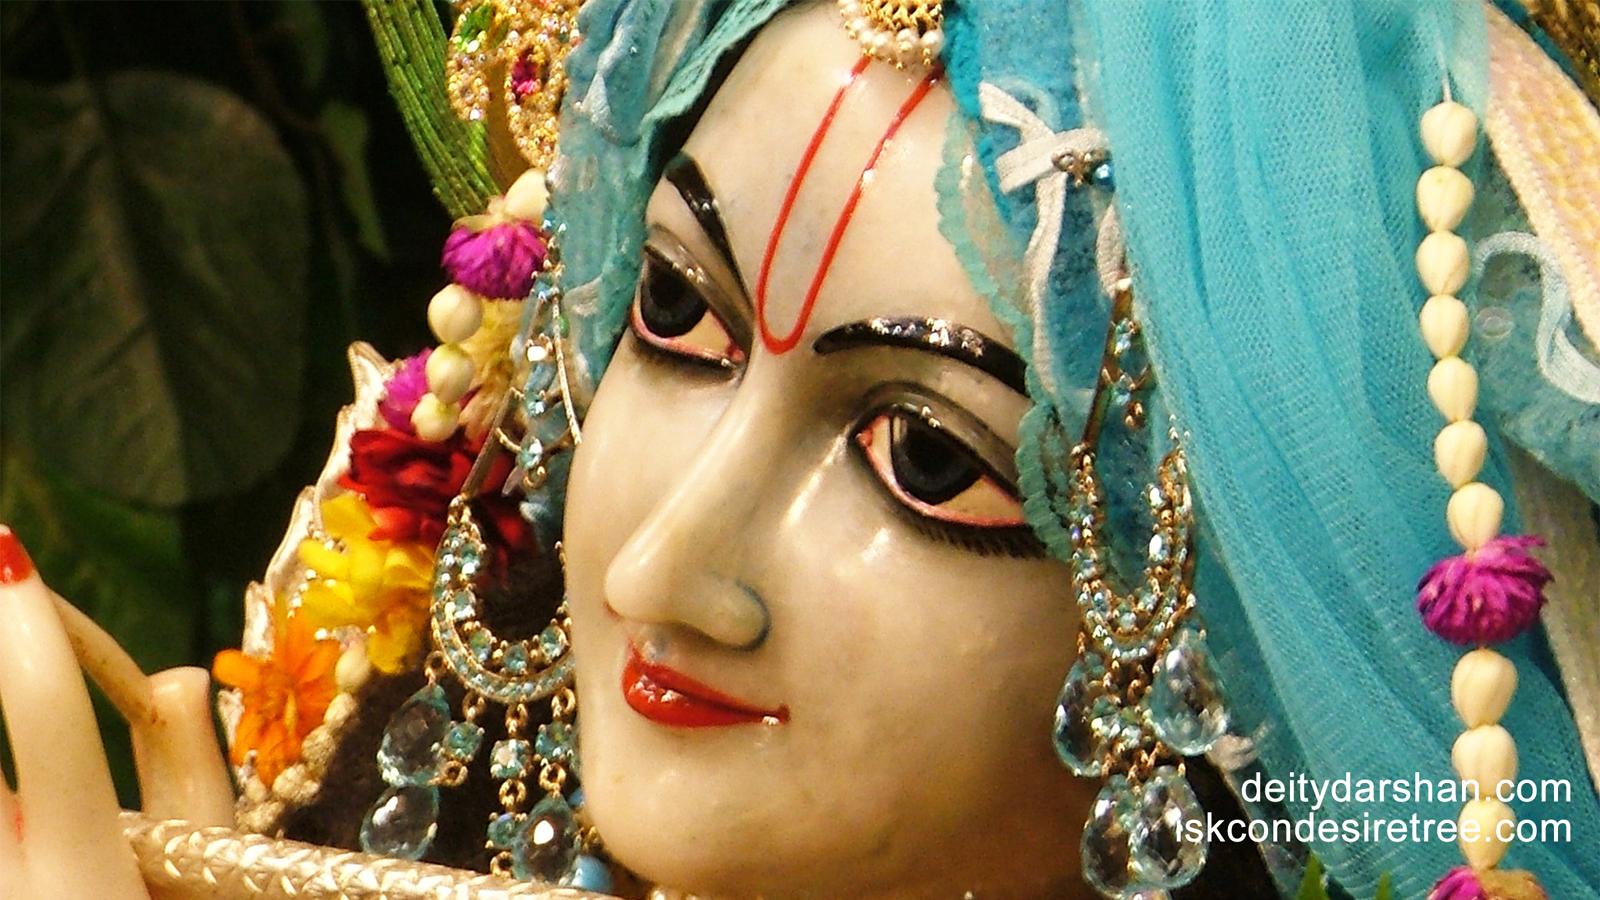 Sri Gopinath Close up Wallpaper (093) Size 1600x900 Download